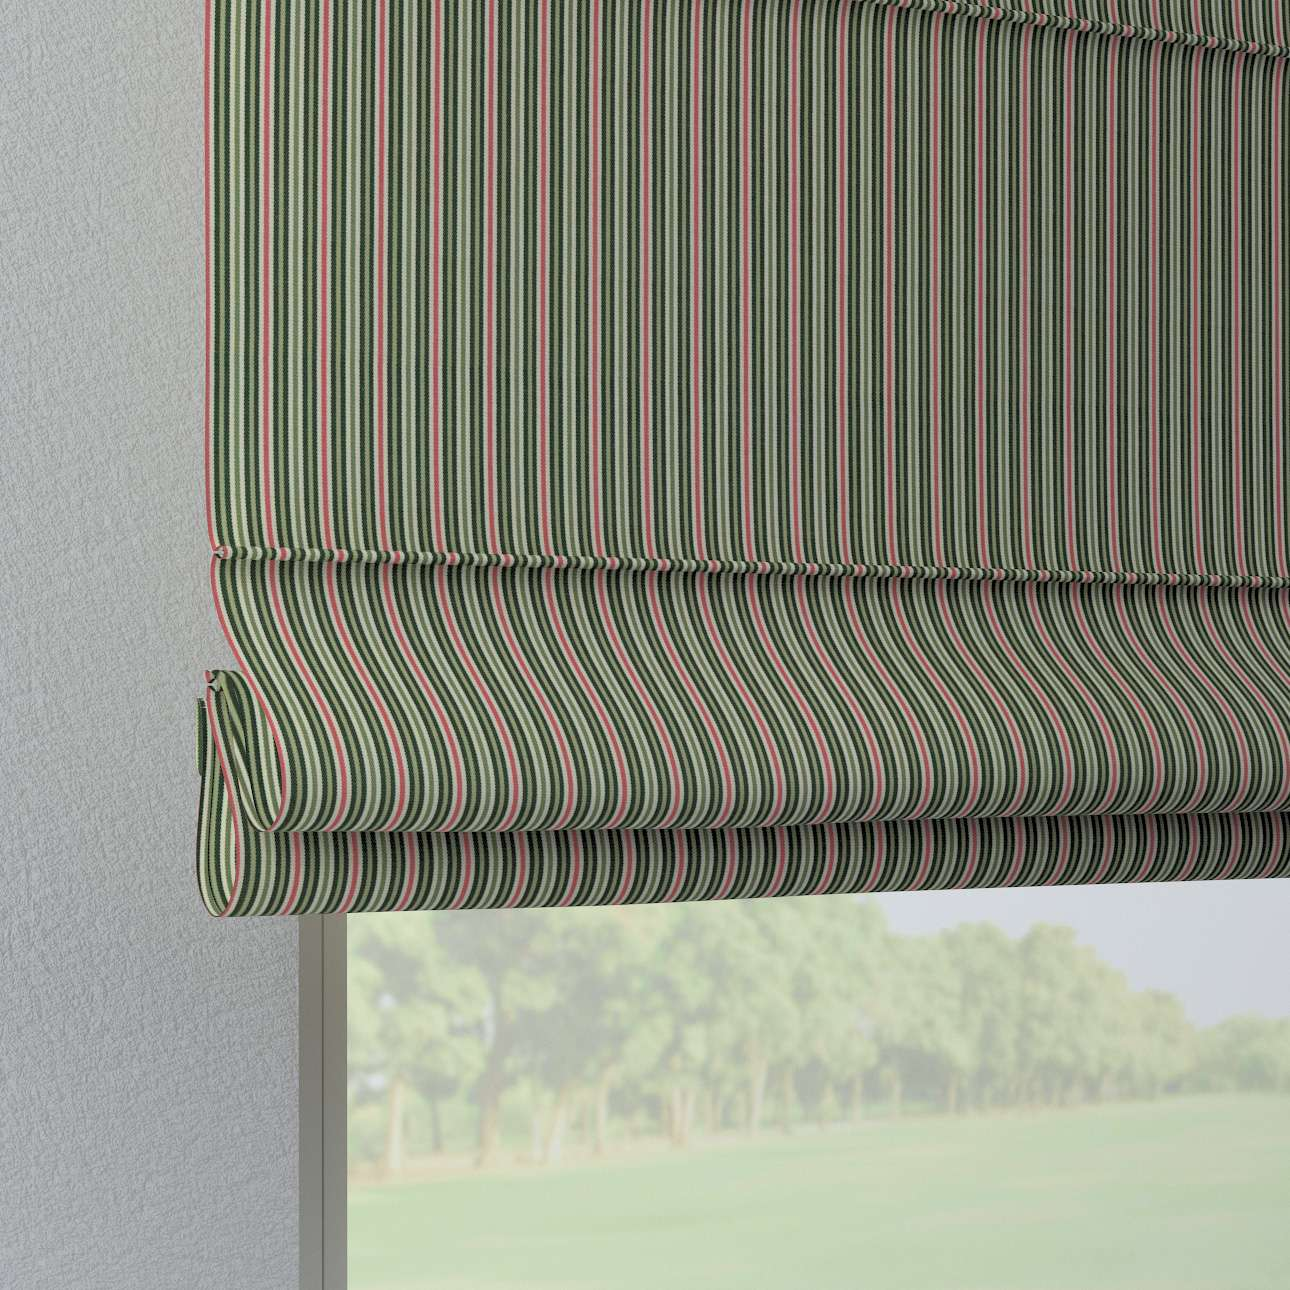 Foldegardin Verona<br/>Med stropper til gardinstang fra kollektionen Londres, Stof: 143-42